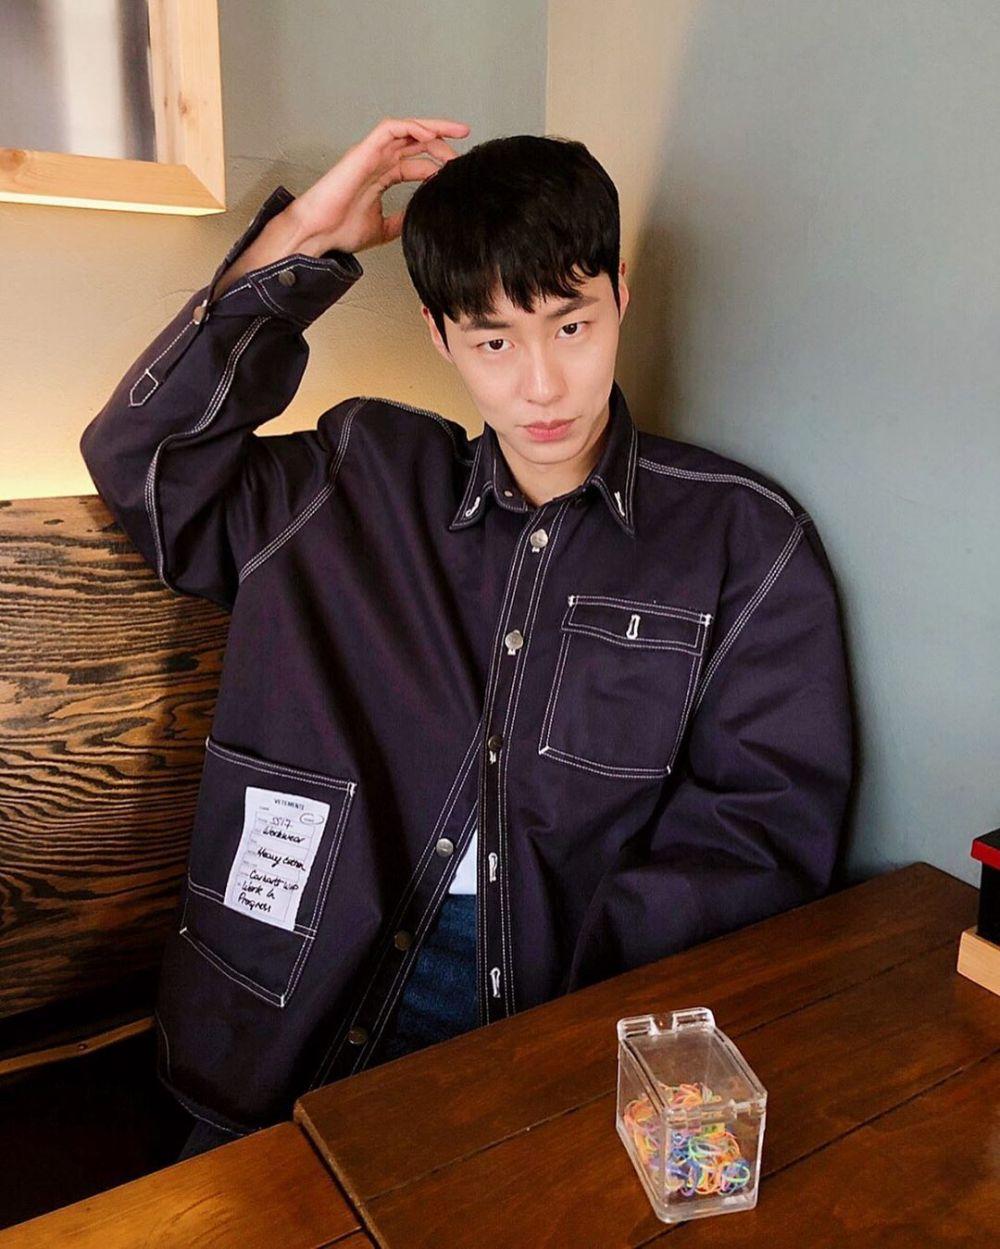 10 Potret Lee Jae Wook, Kekasih Lee Da Hee di KDrama Search: WWW